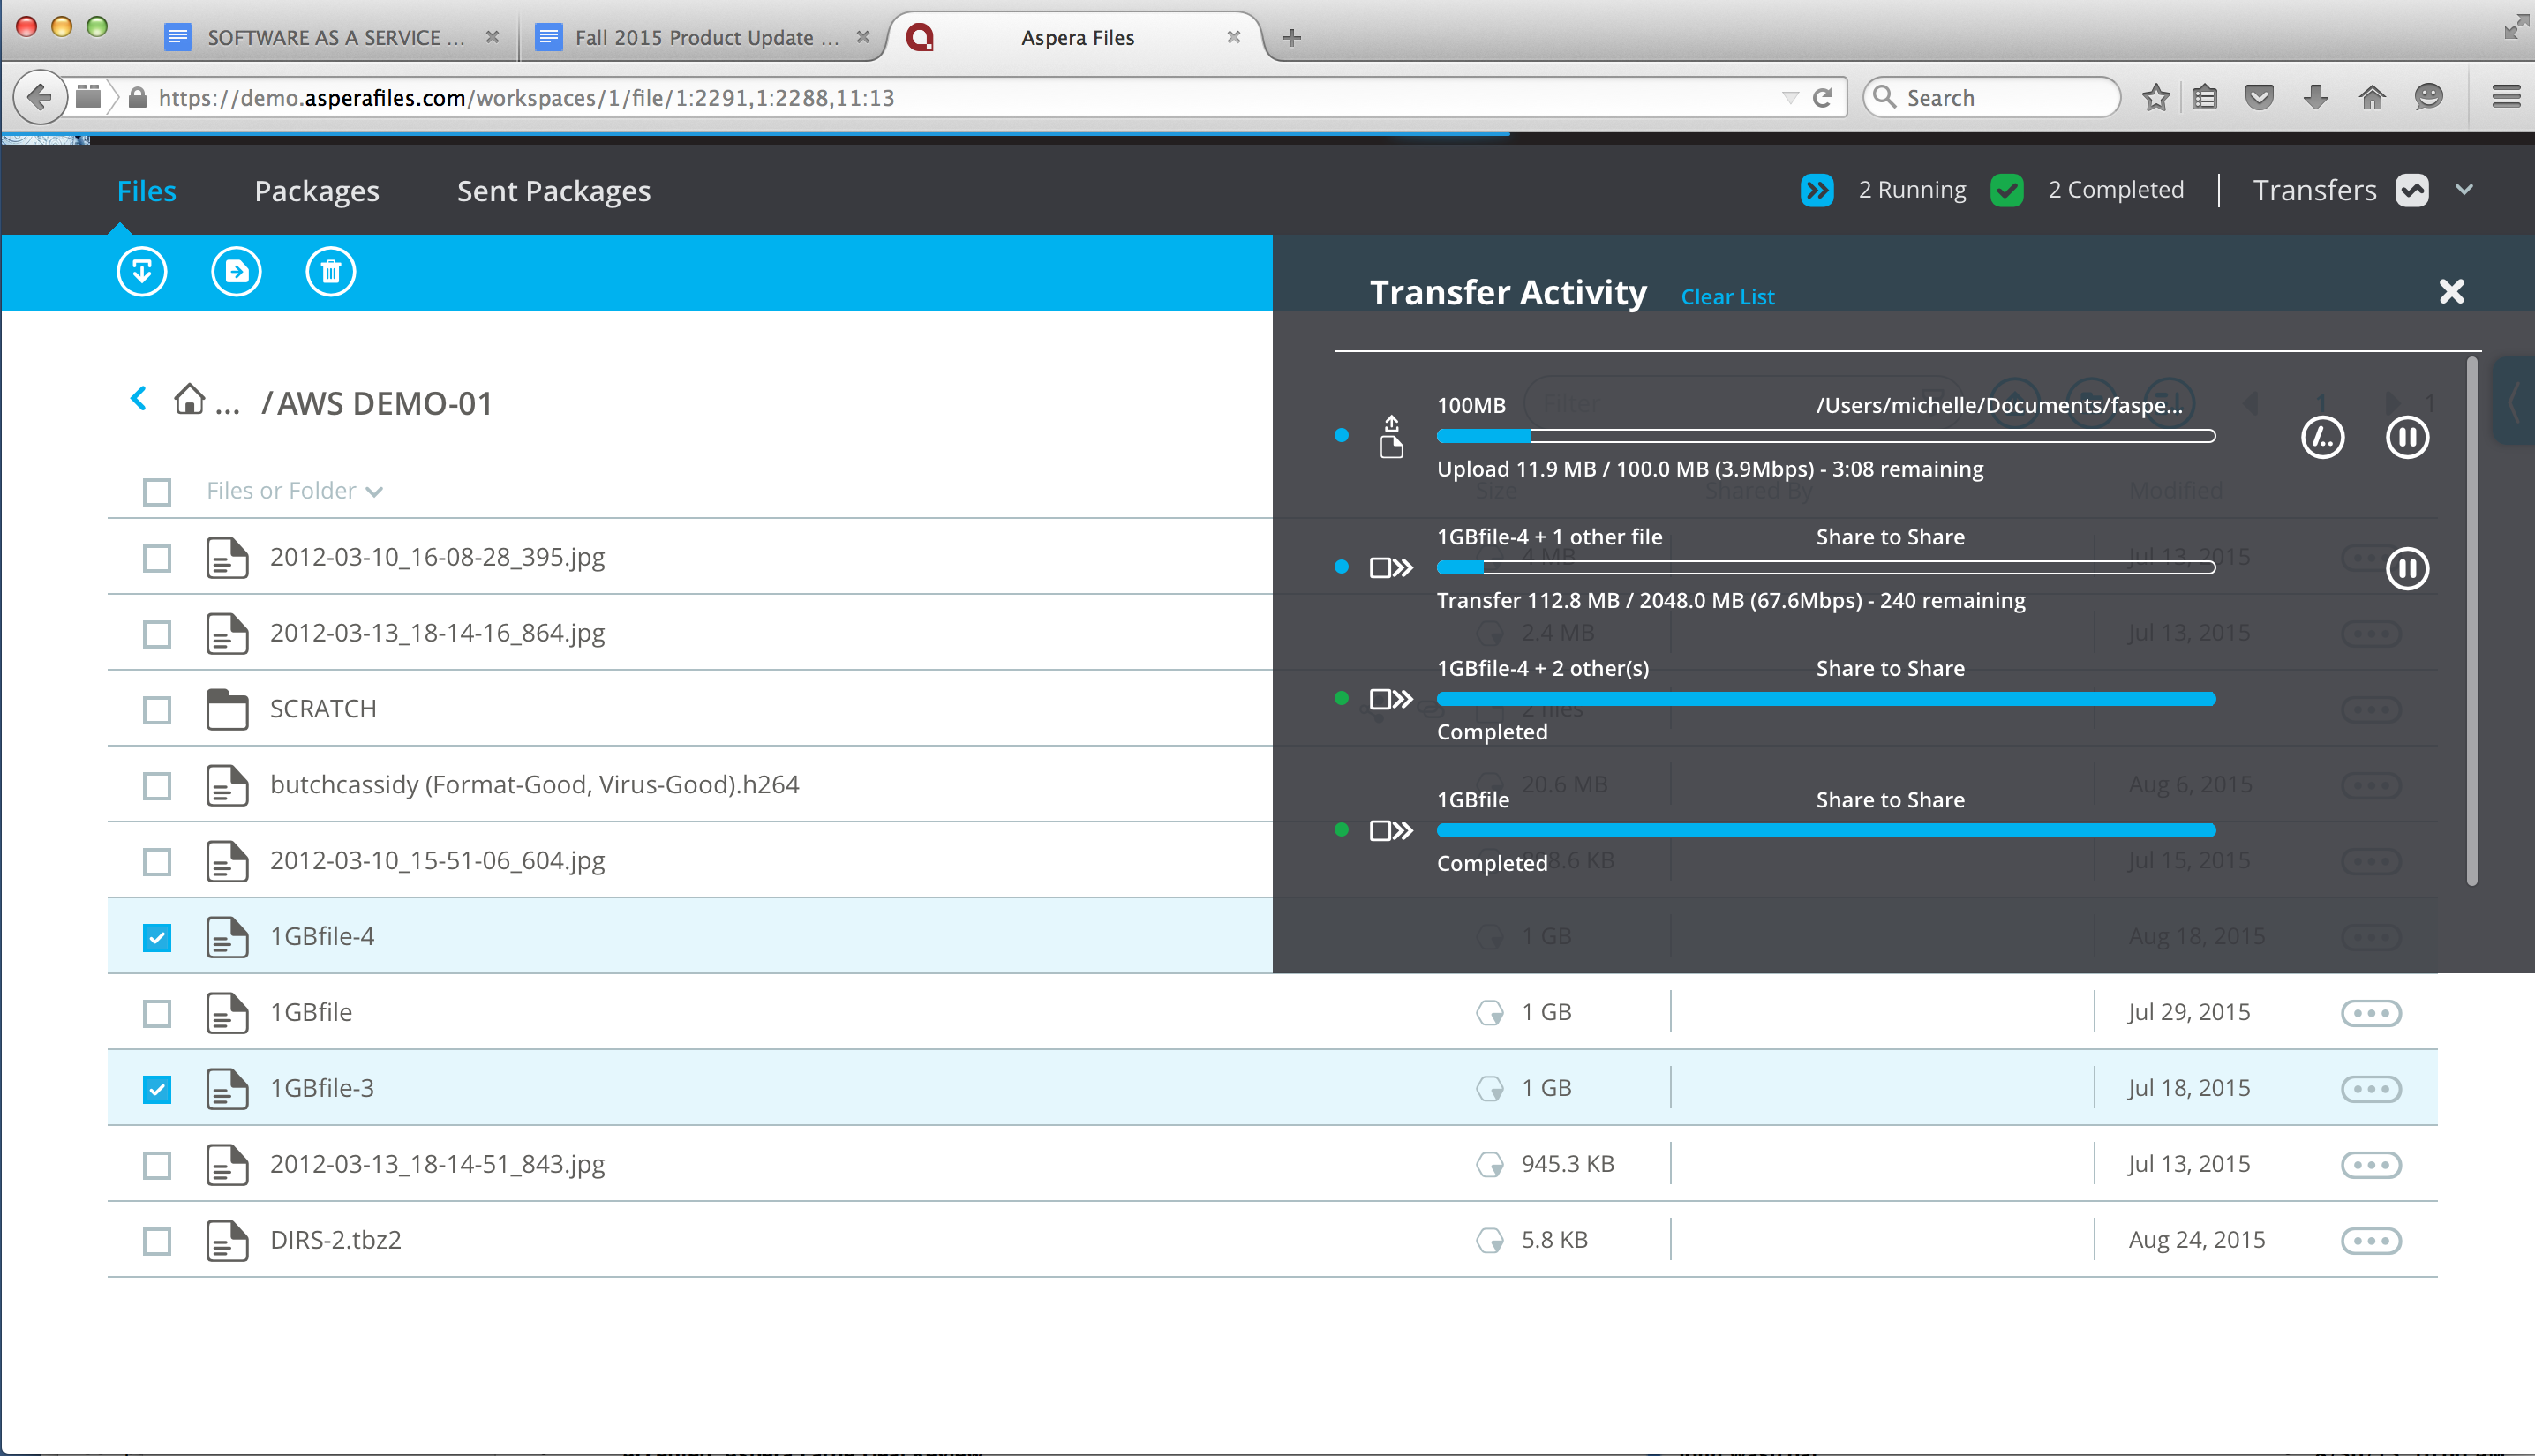 IBM Aspera Files™ Demo -